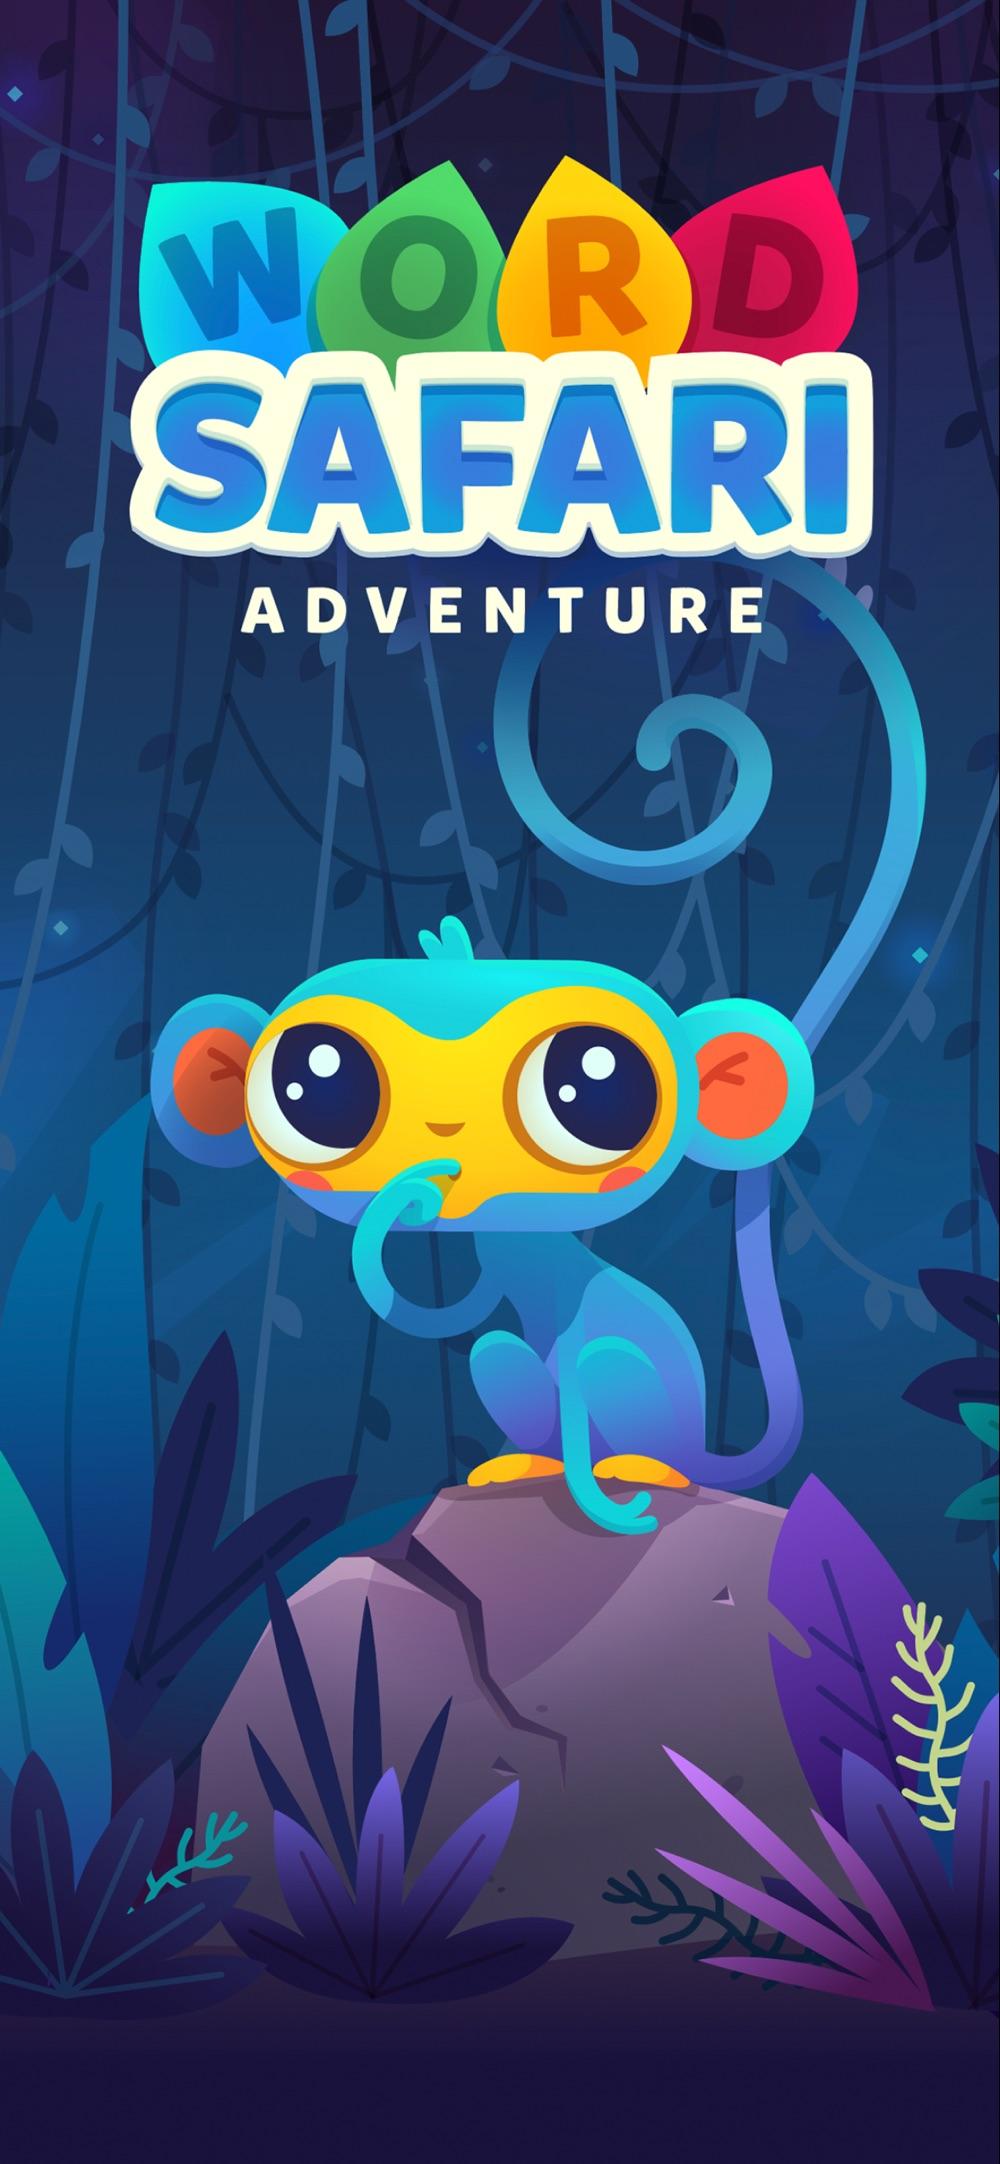 Word Safari Adventure hack tool